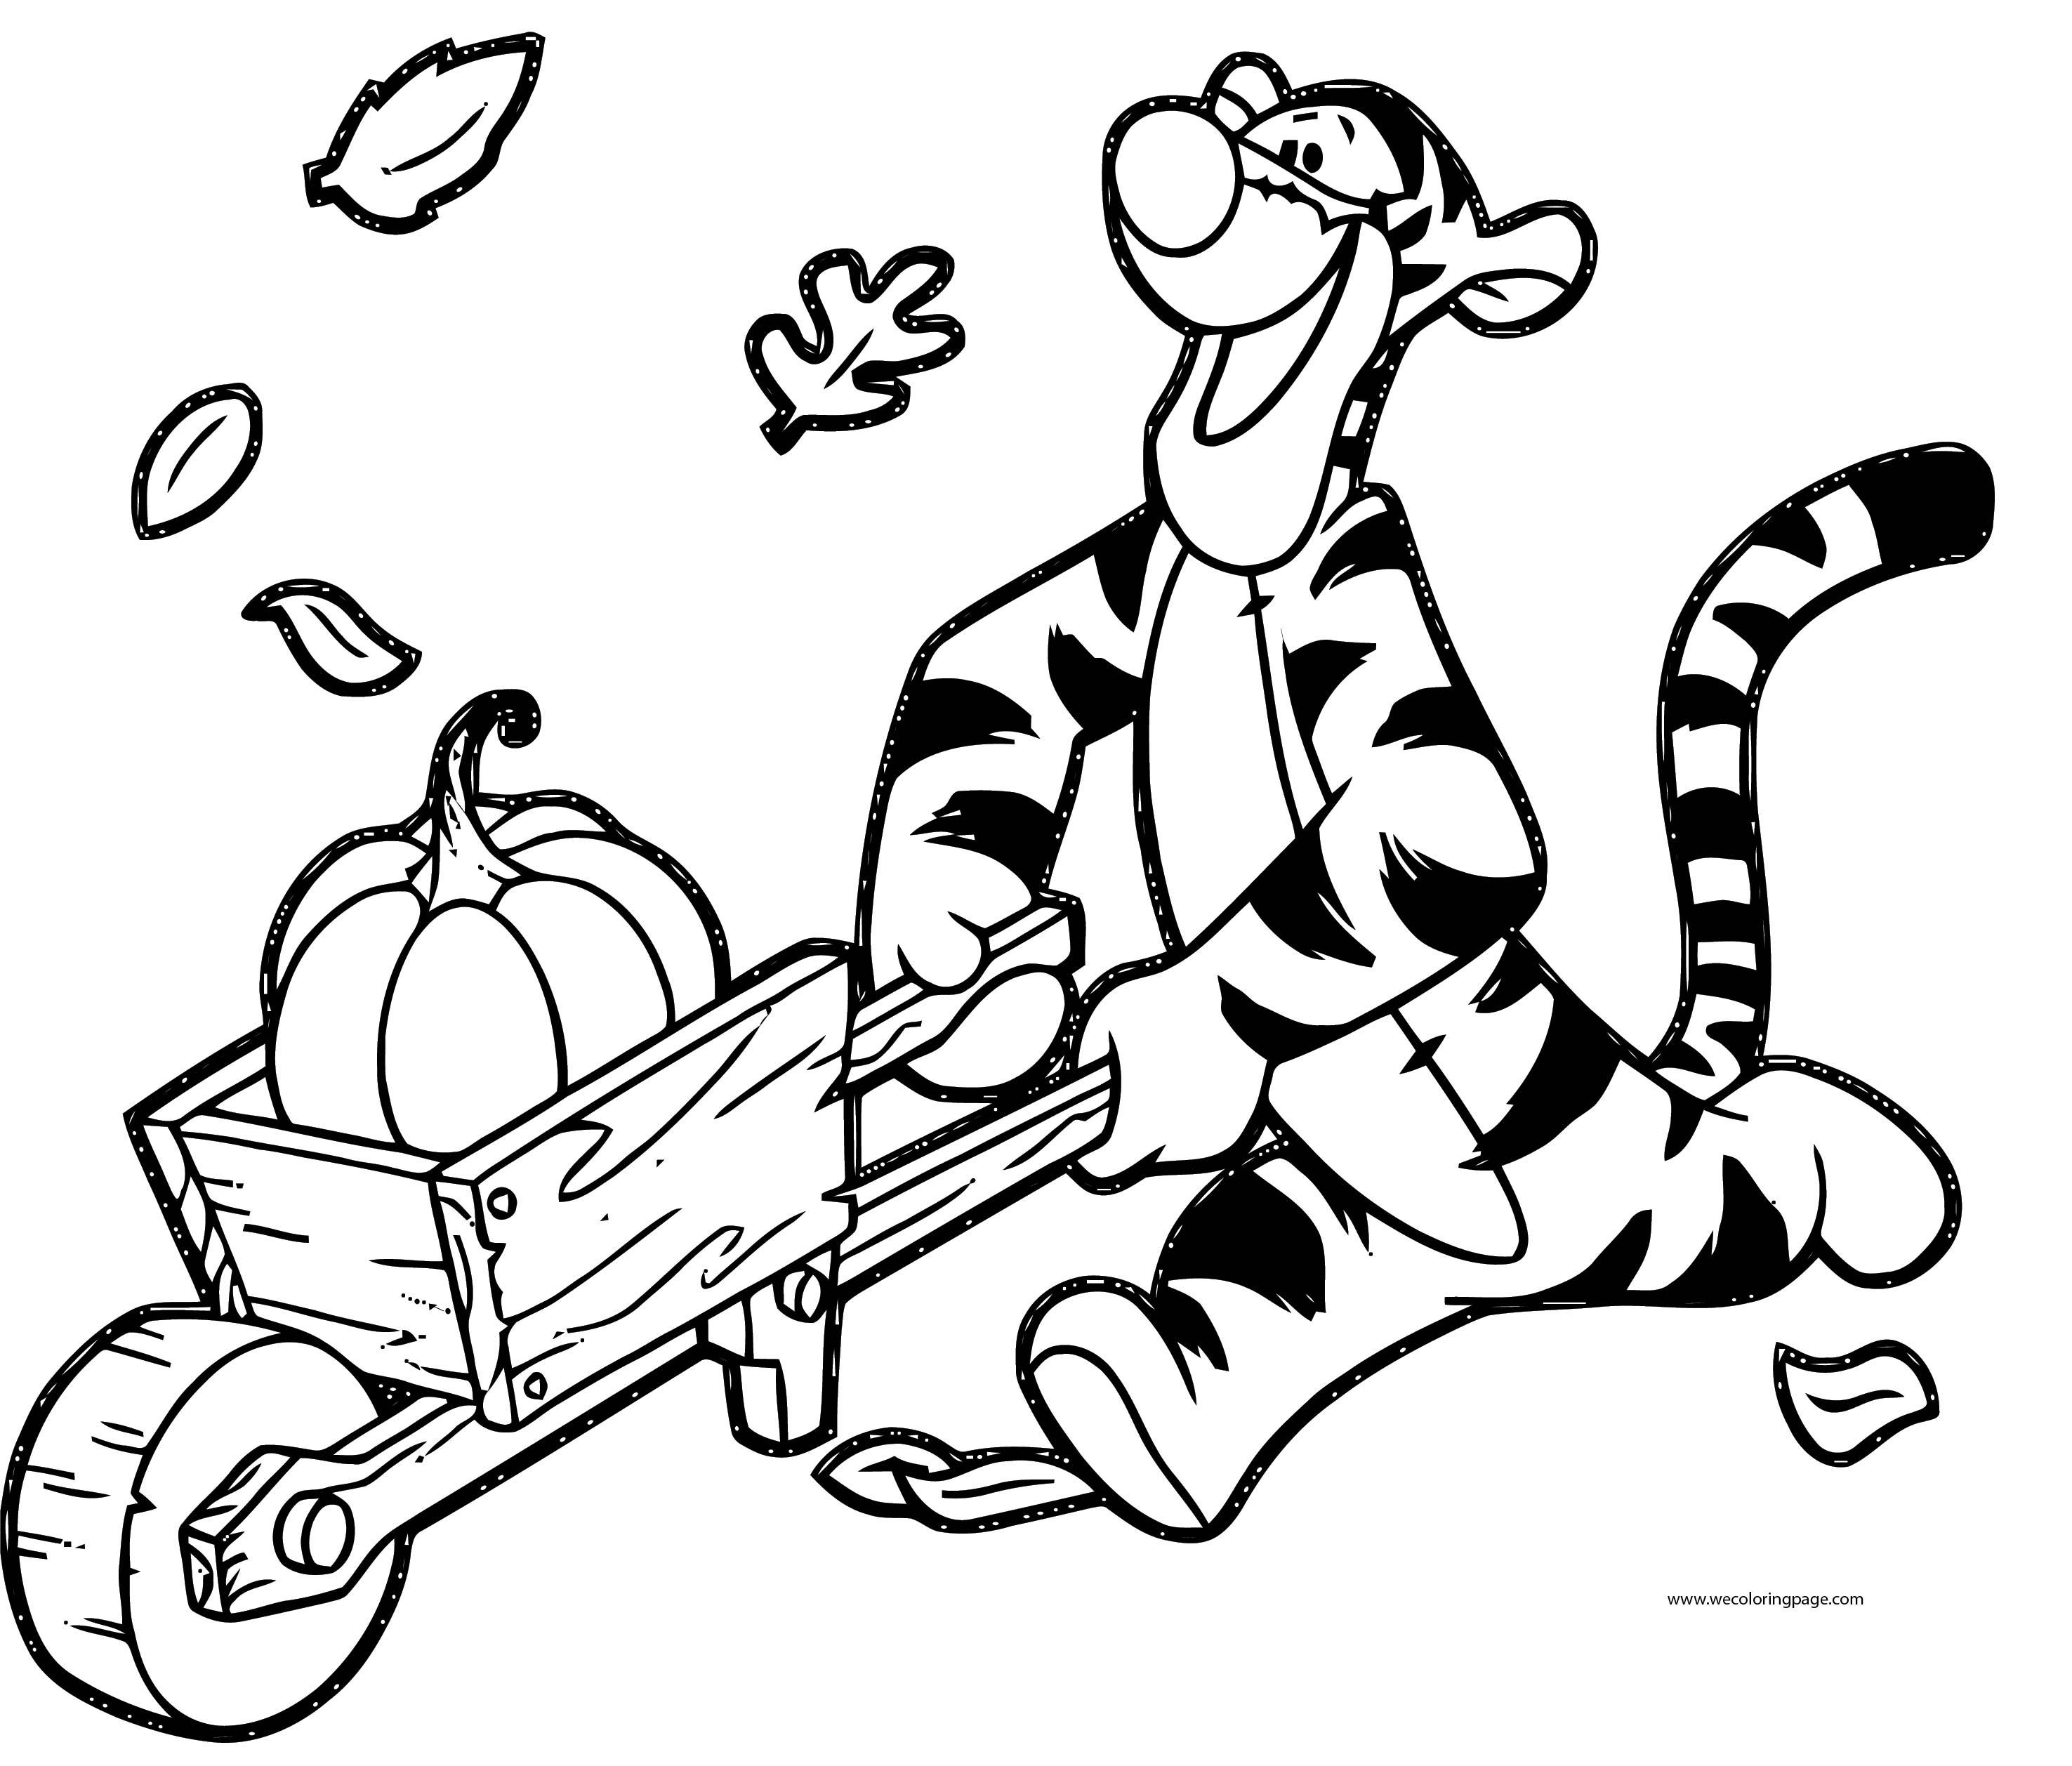 Fall Tigger Carrying Pumpkin Coloring Page | Wecoloringpage.com